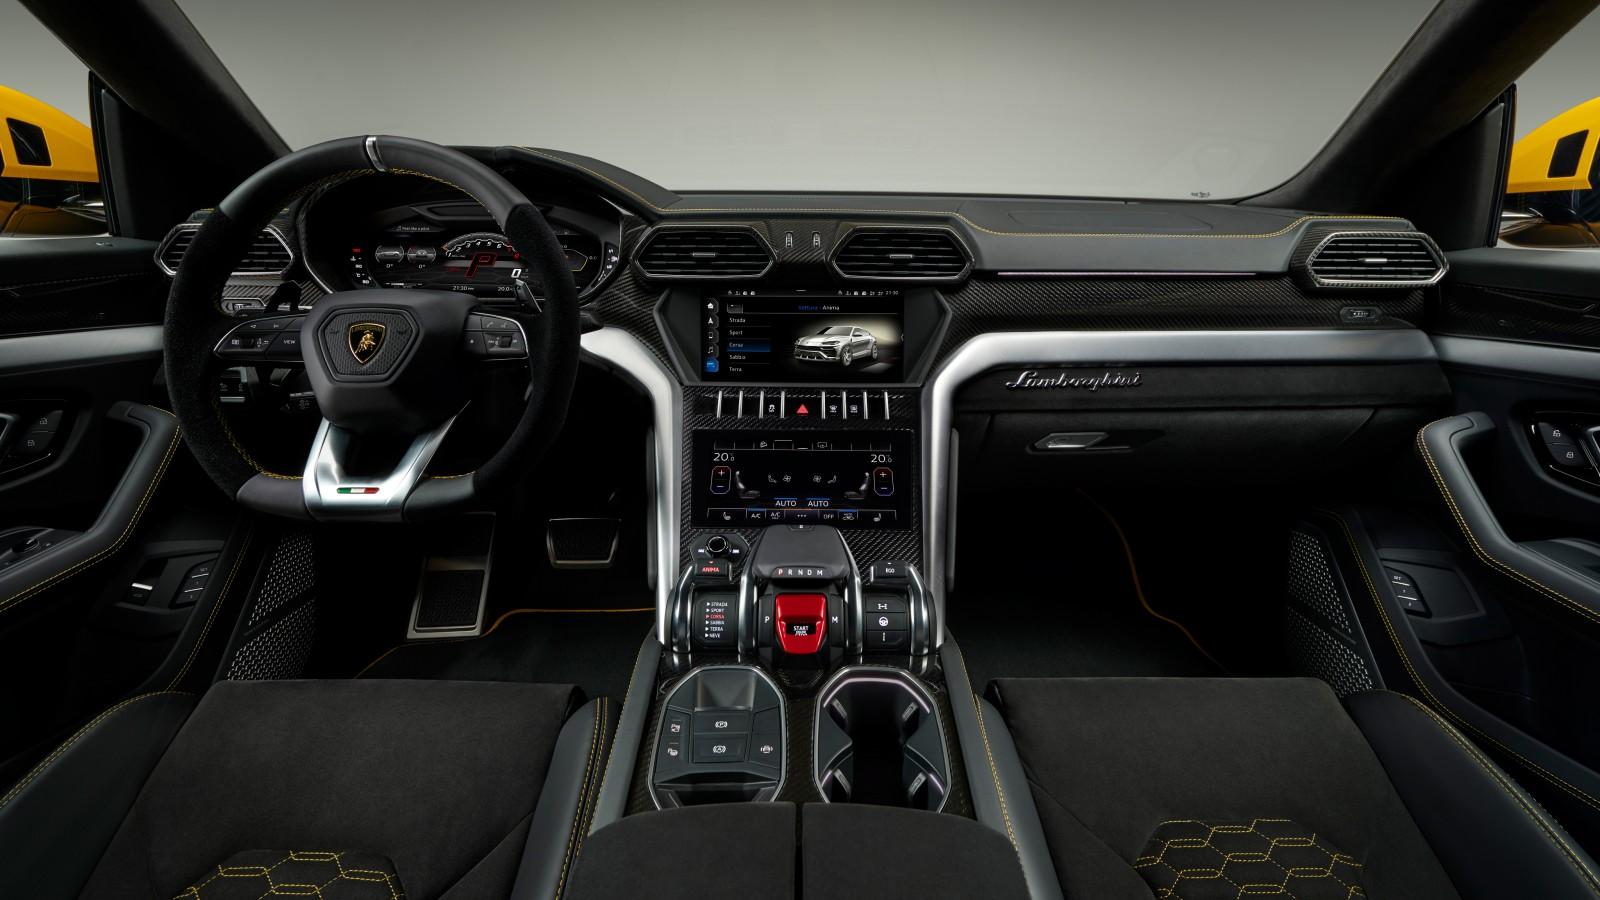 2018 Lamborghini Urus Interior 4k Wallpaper Hd Car Wallpapers Id